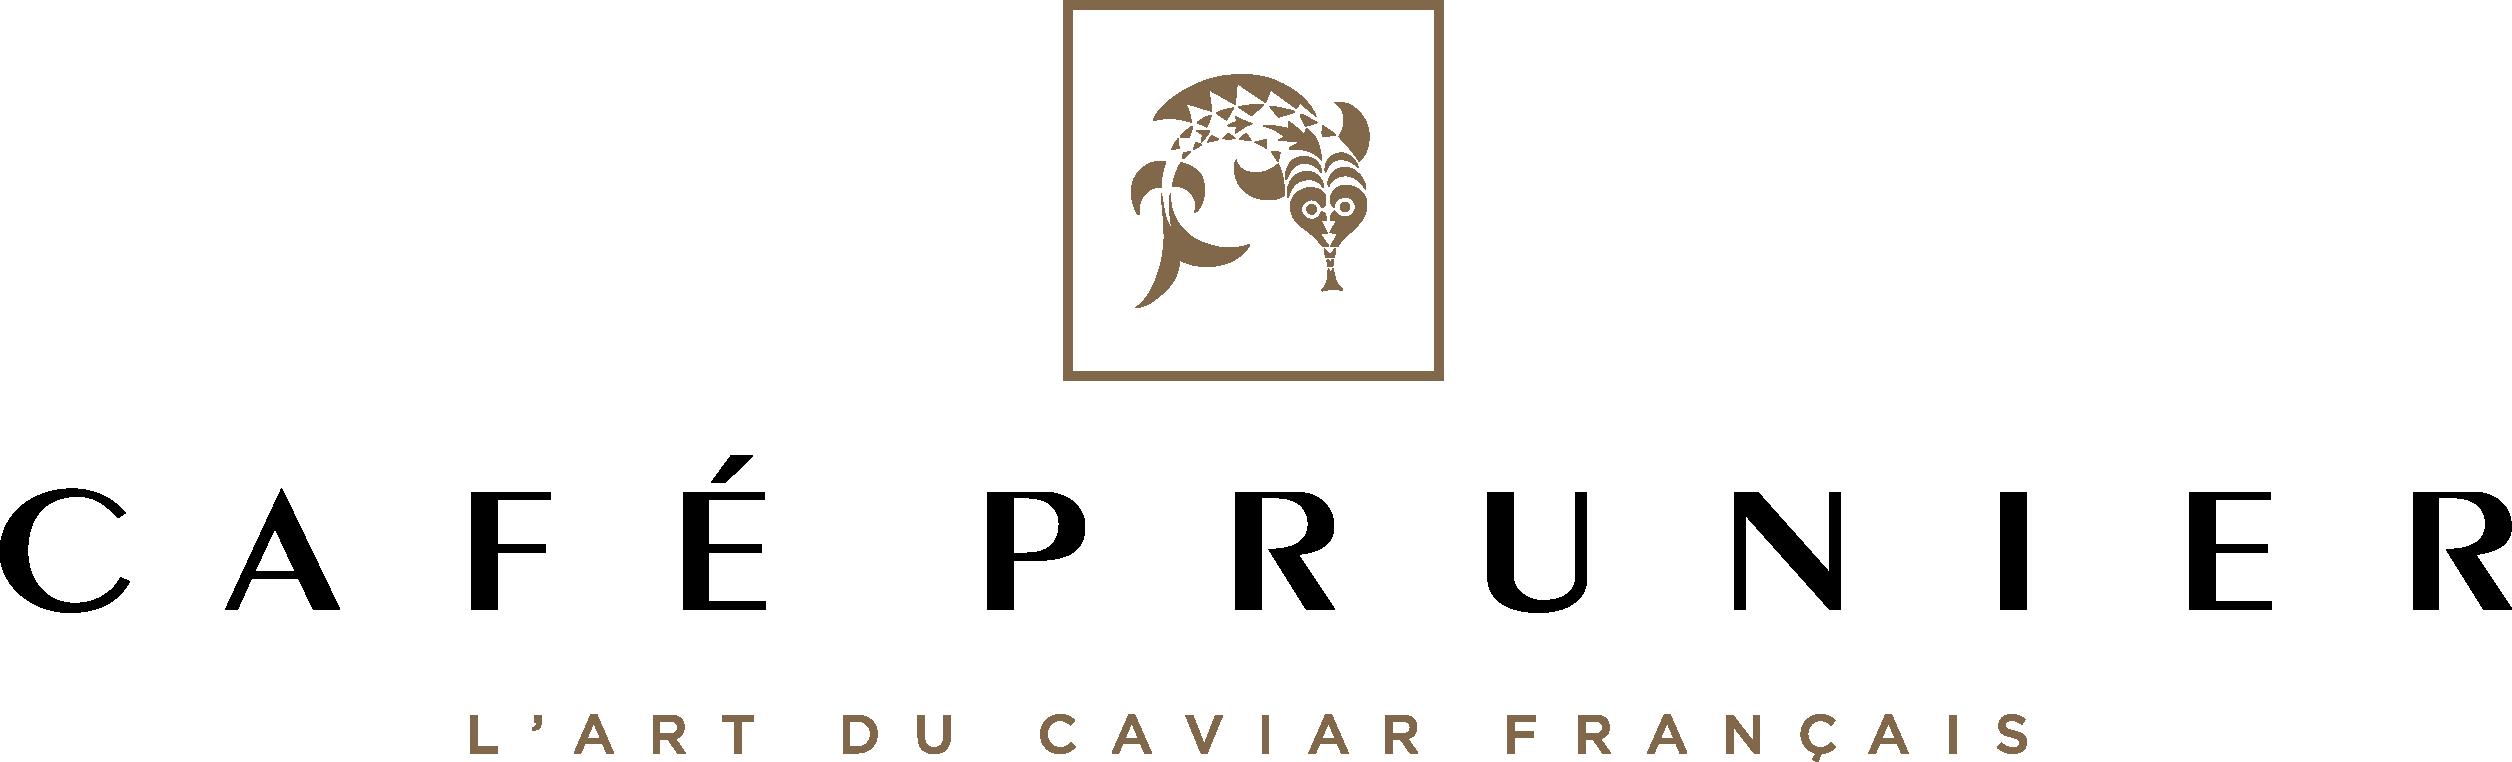 Logo Chez Prunier